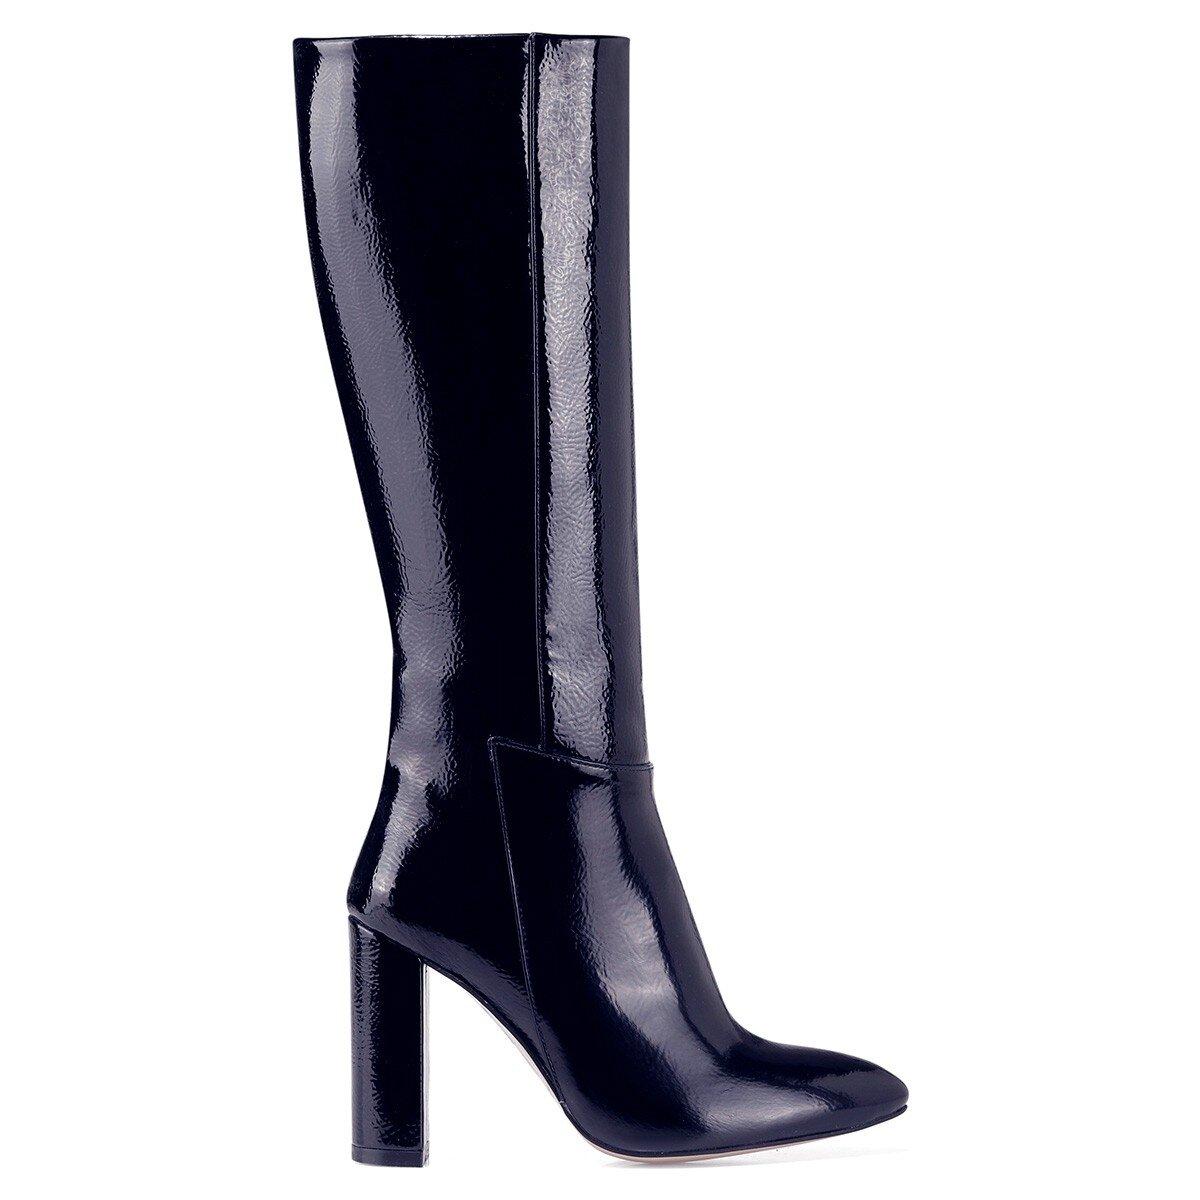 MIMA Lacivert Kadın Topuklu Çizme